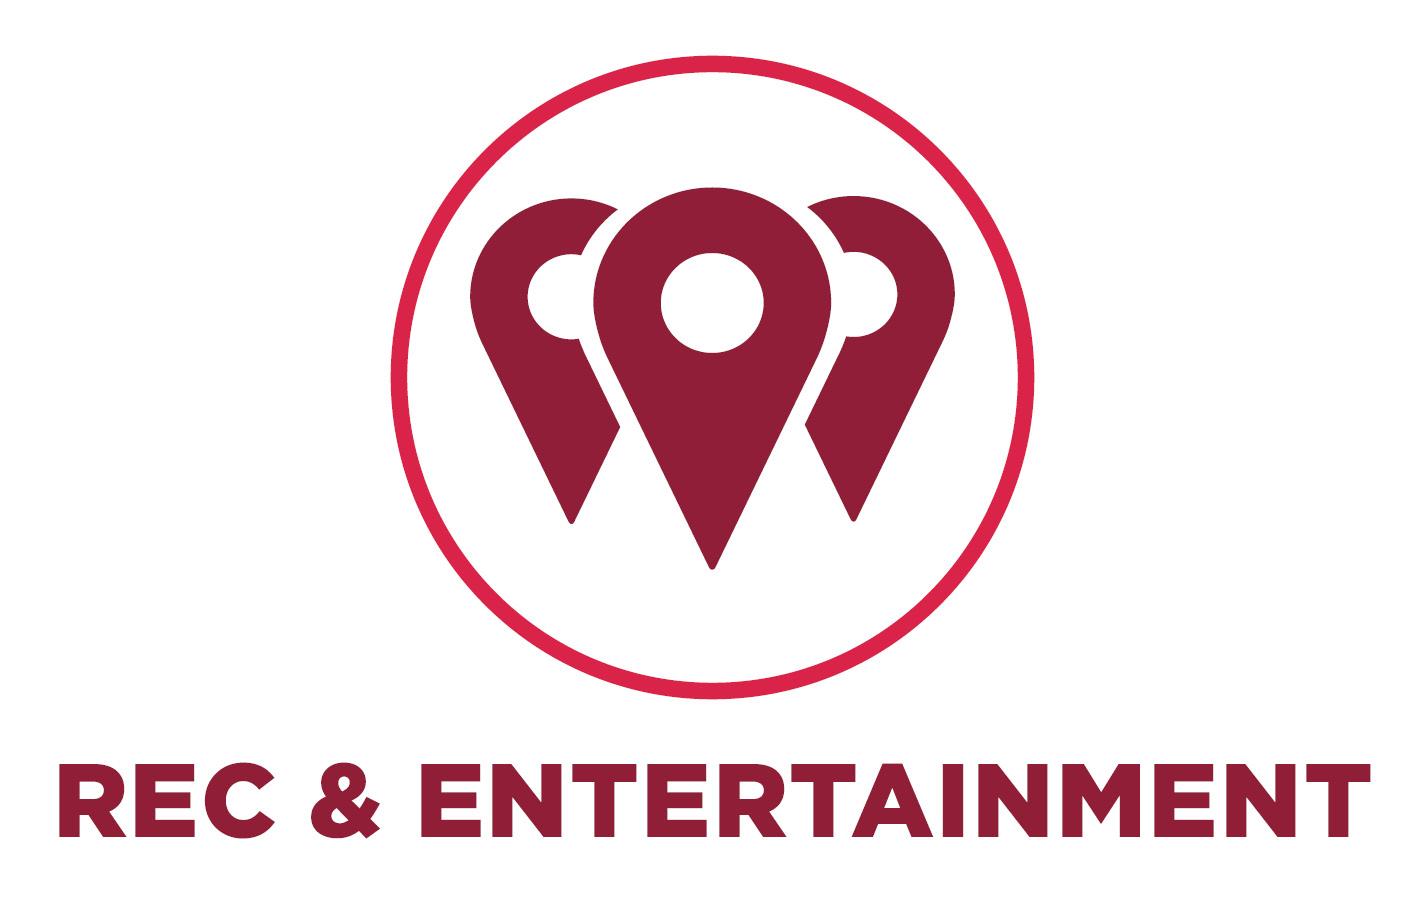 Rec & Entertainment